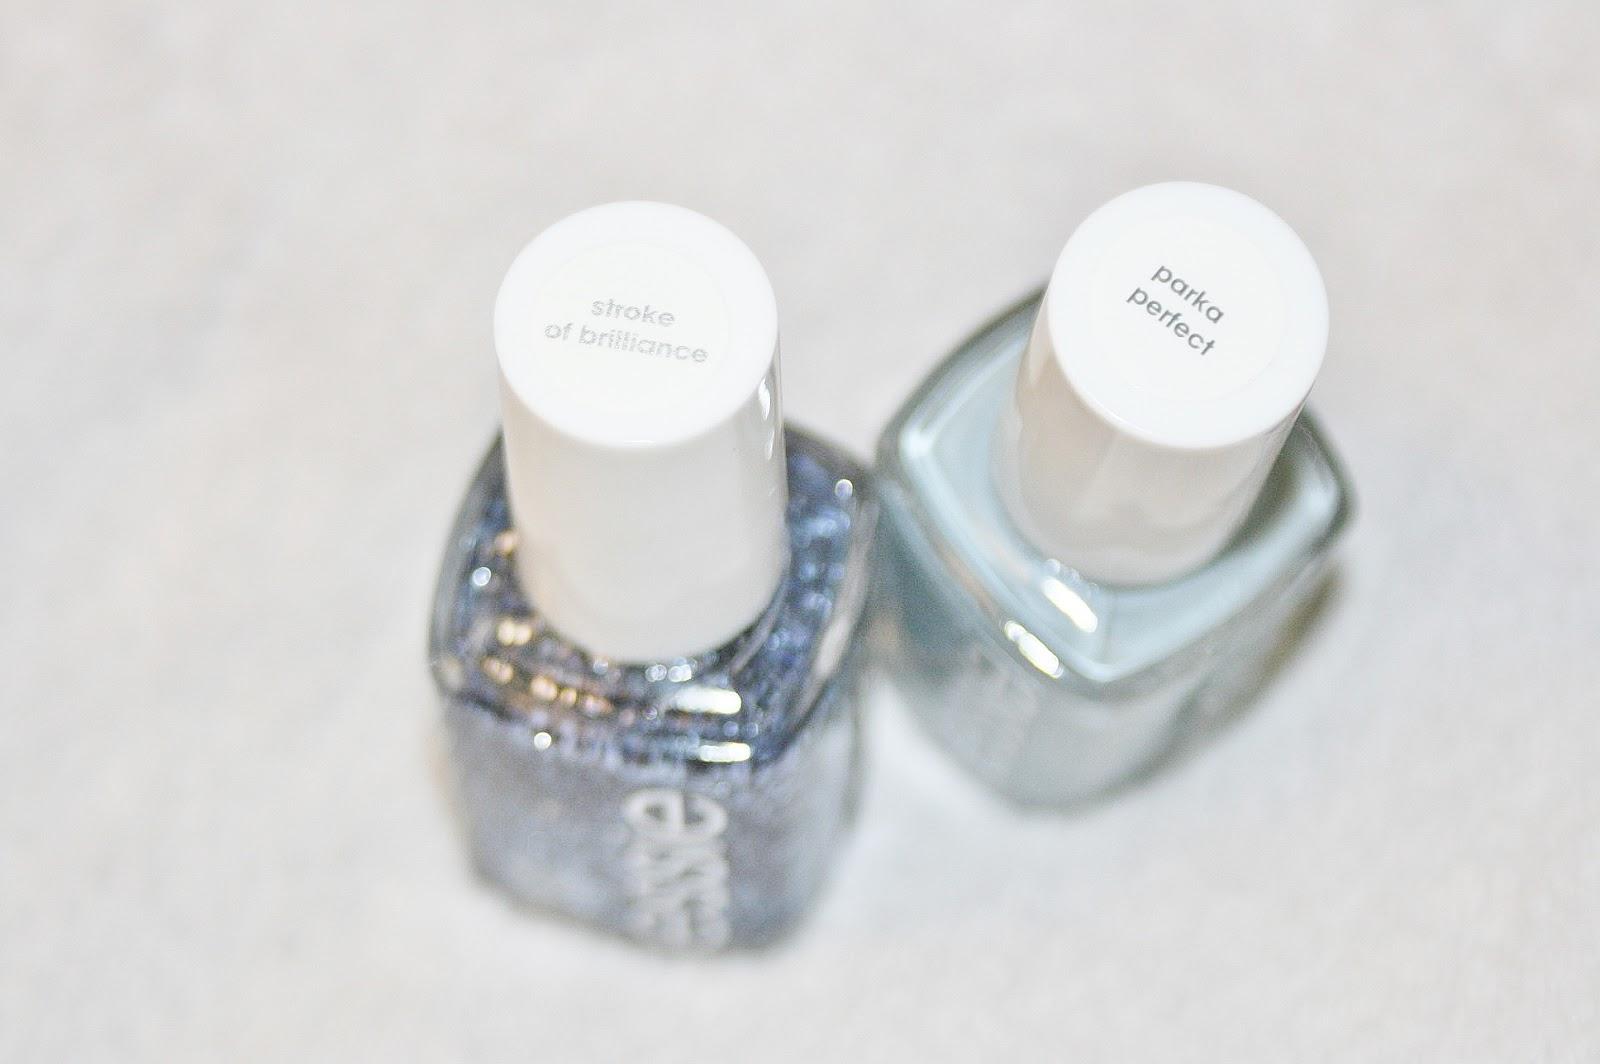 Winter essie nail polishes